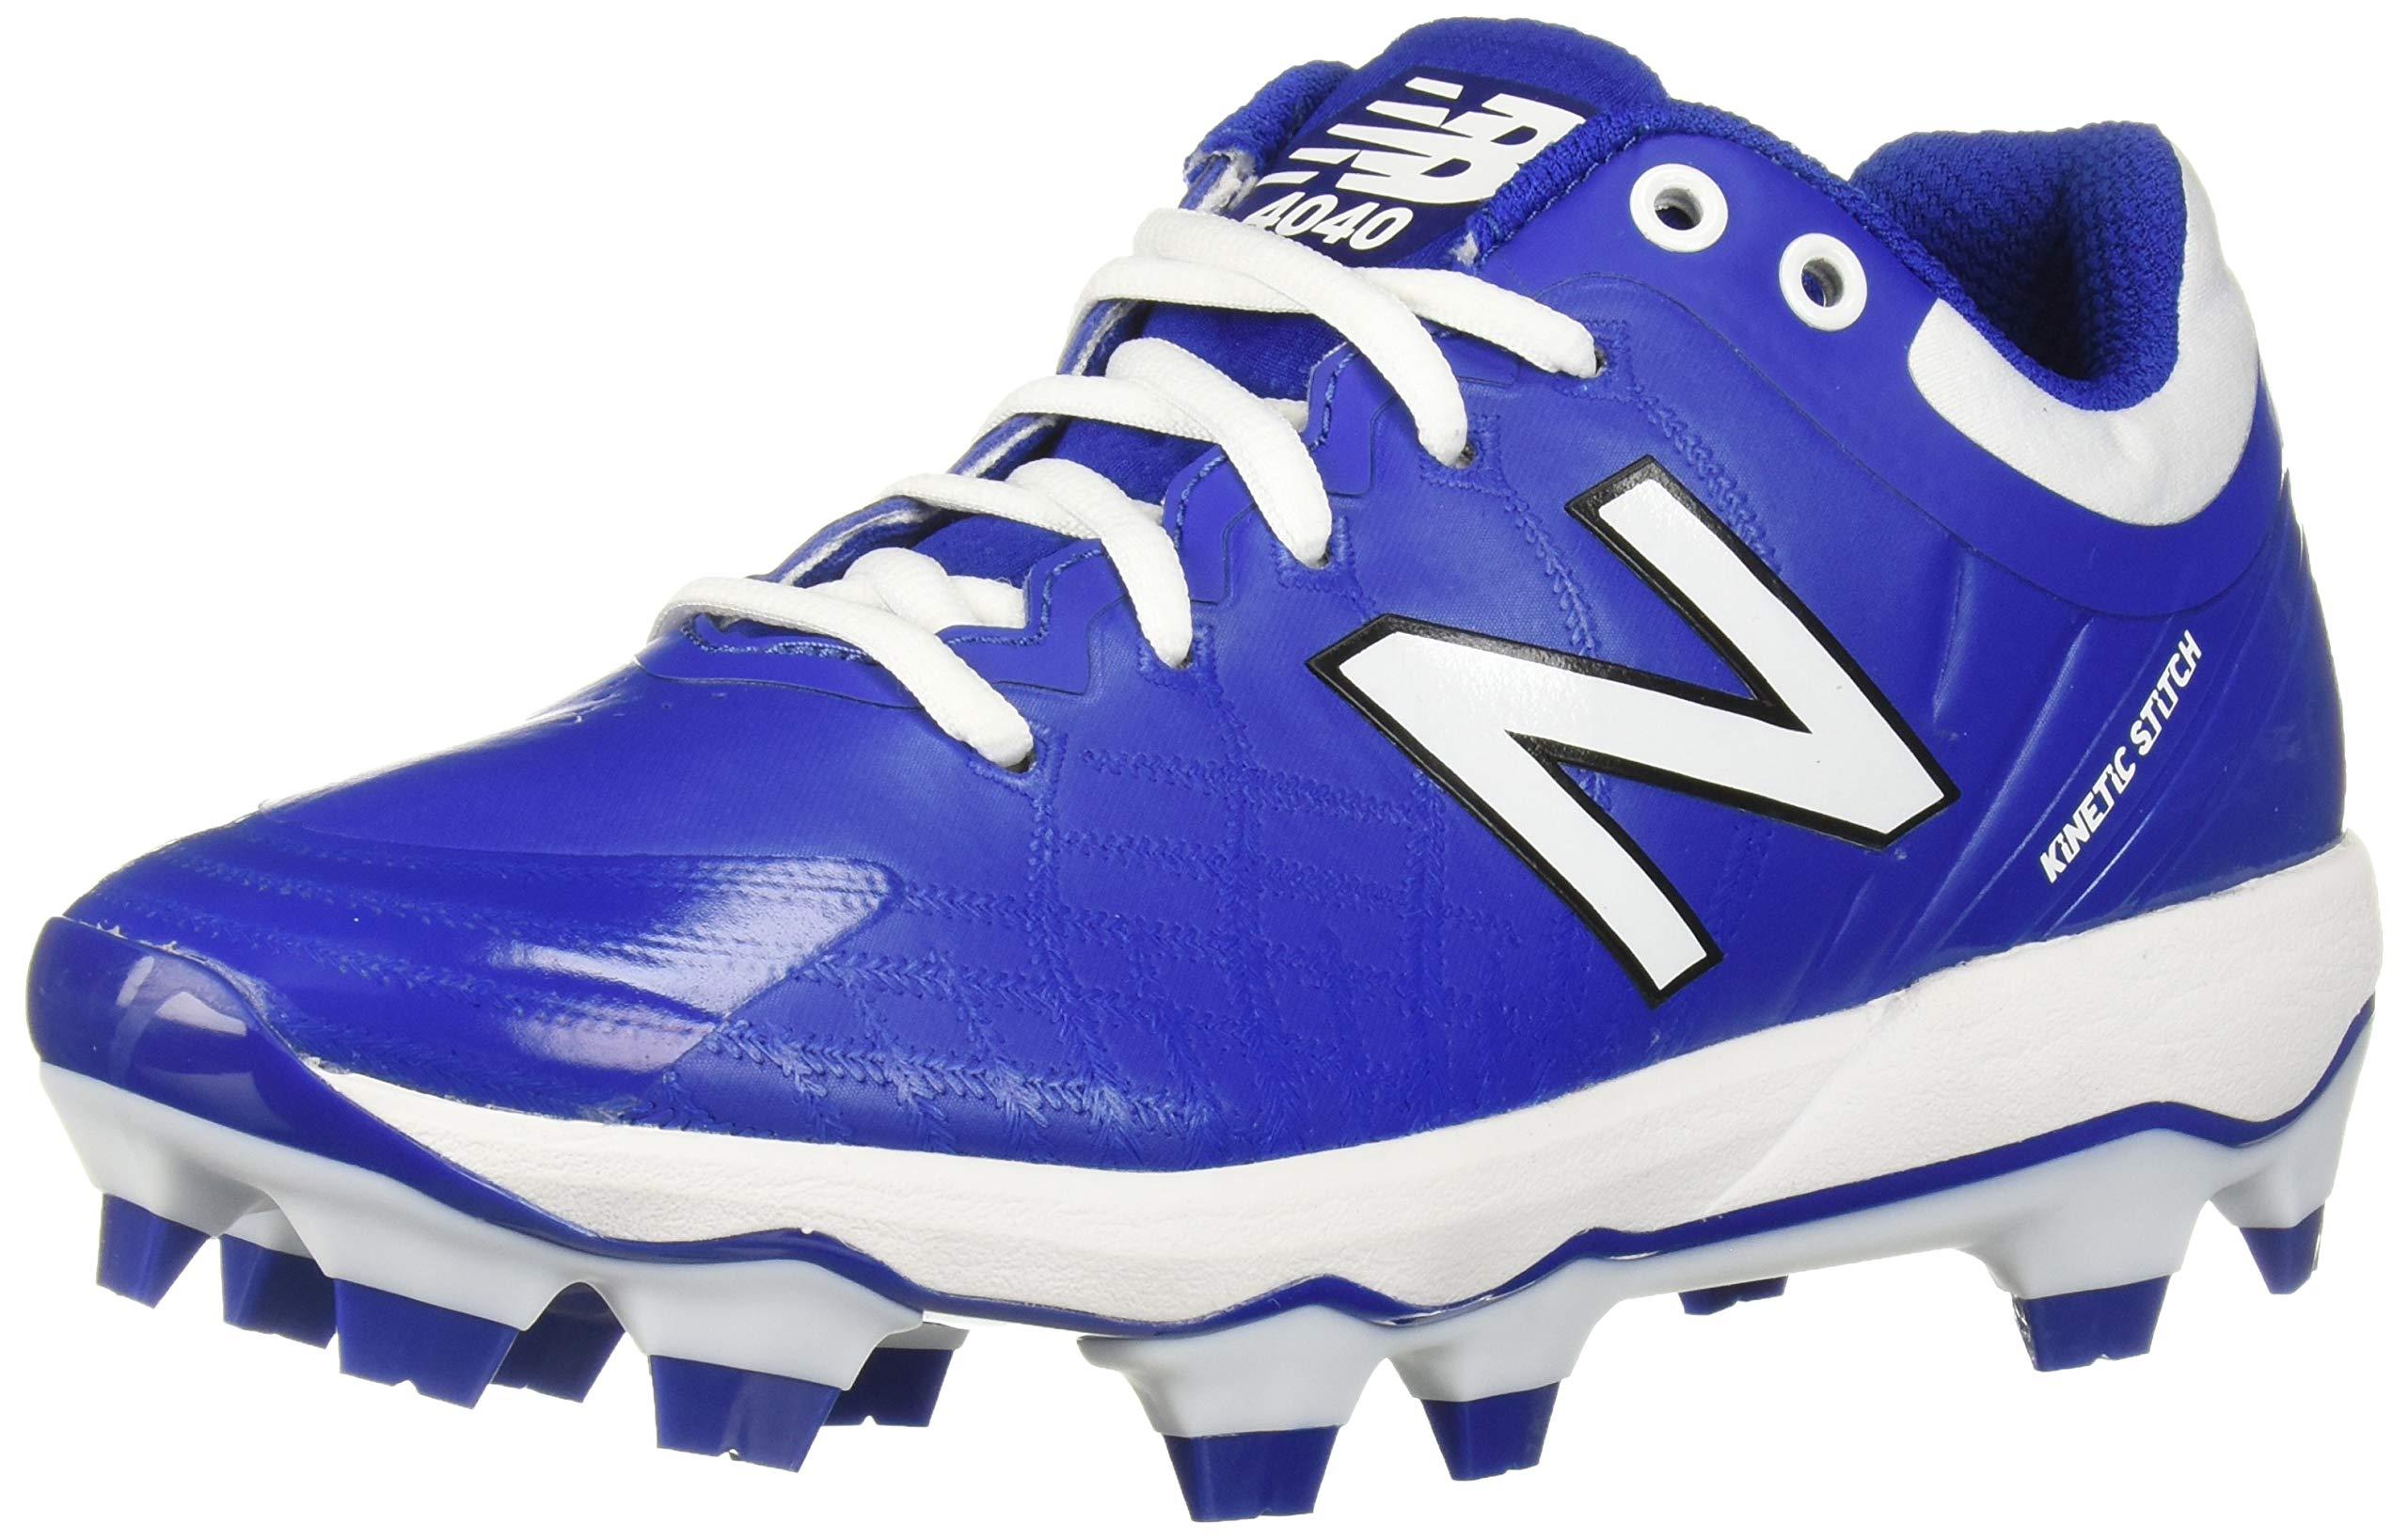 New Balance Men's 4040v5 Molded Baseball Shoe, Royal/White, 5 M by New Balance